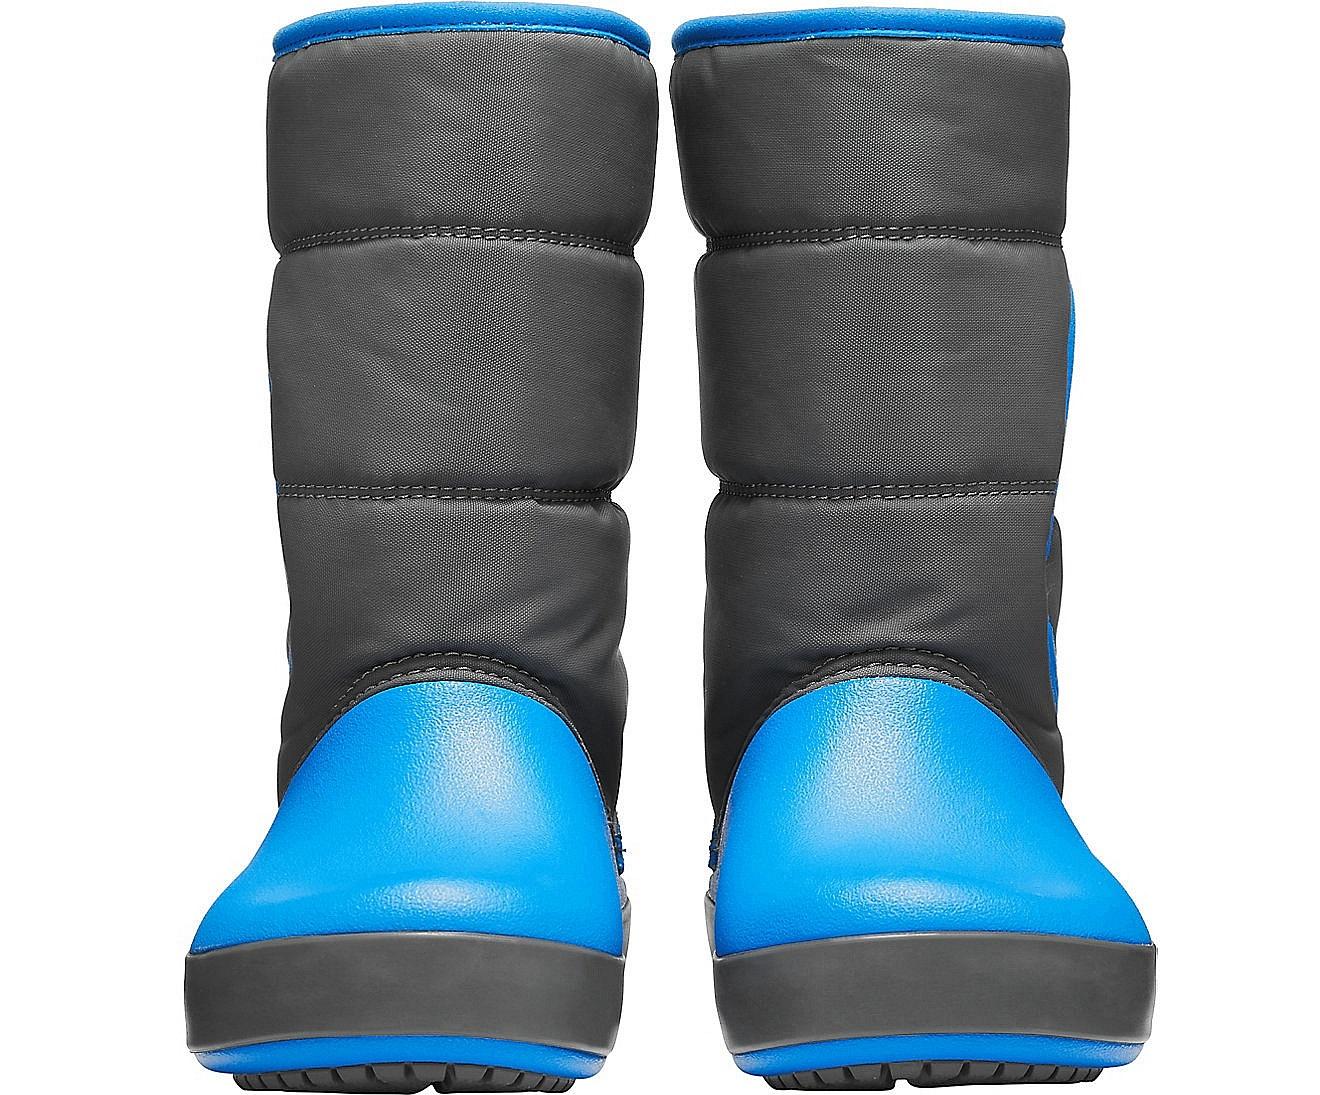 ... detské topánky Crocs Lodge Point Snow Boot - Slate Gray Ocean ... 23eb300553